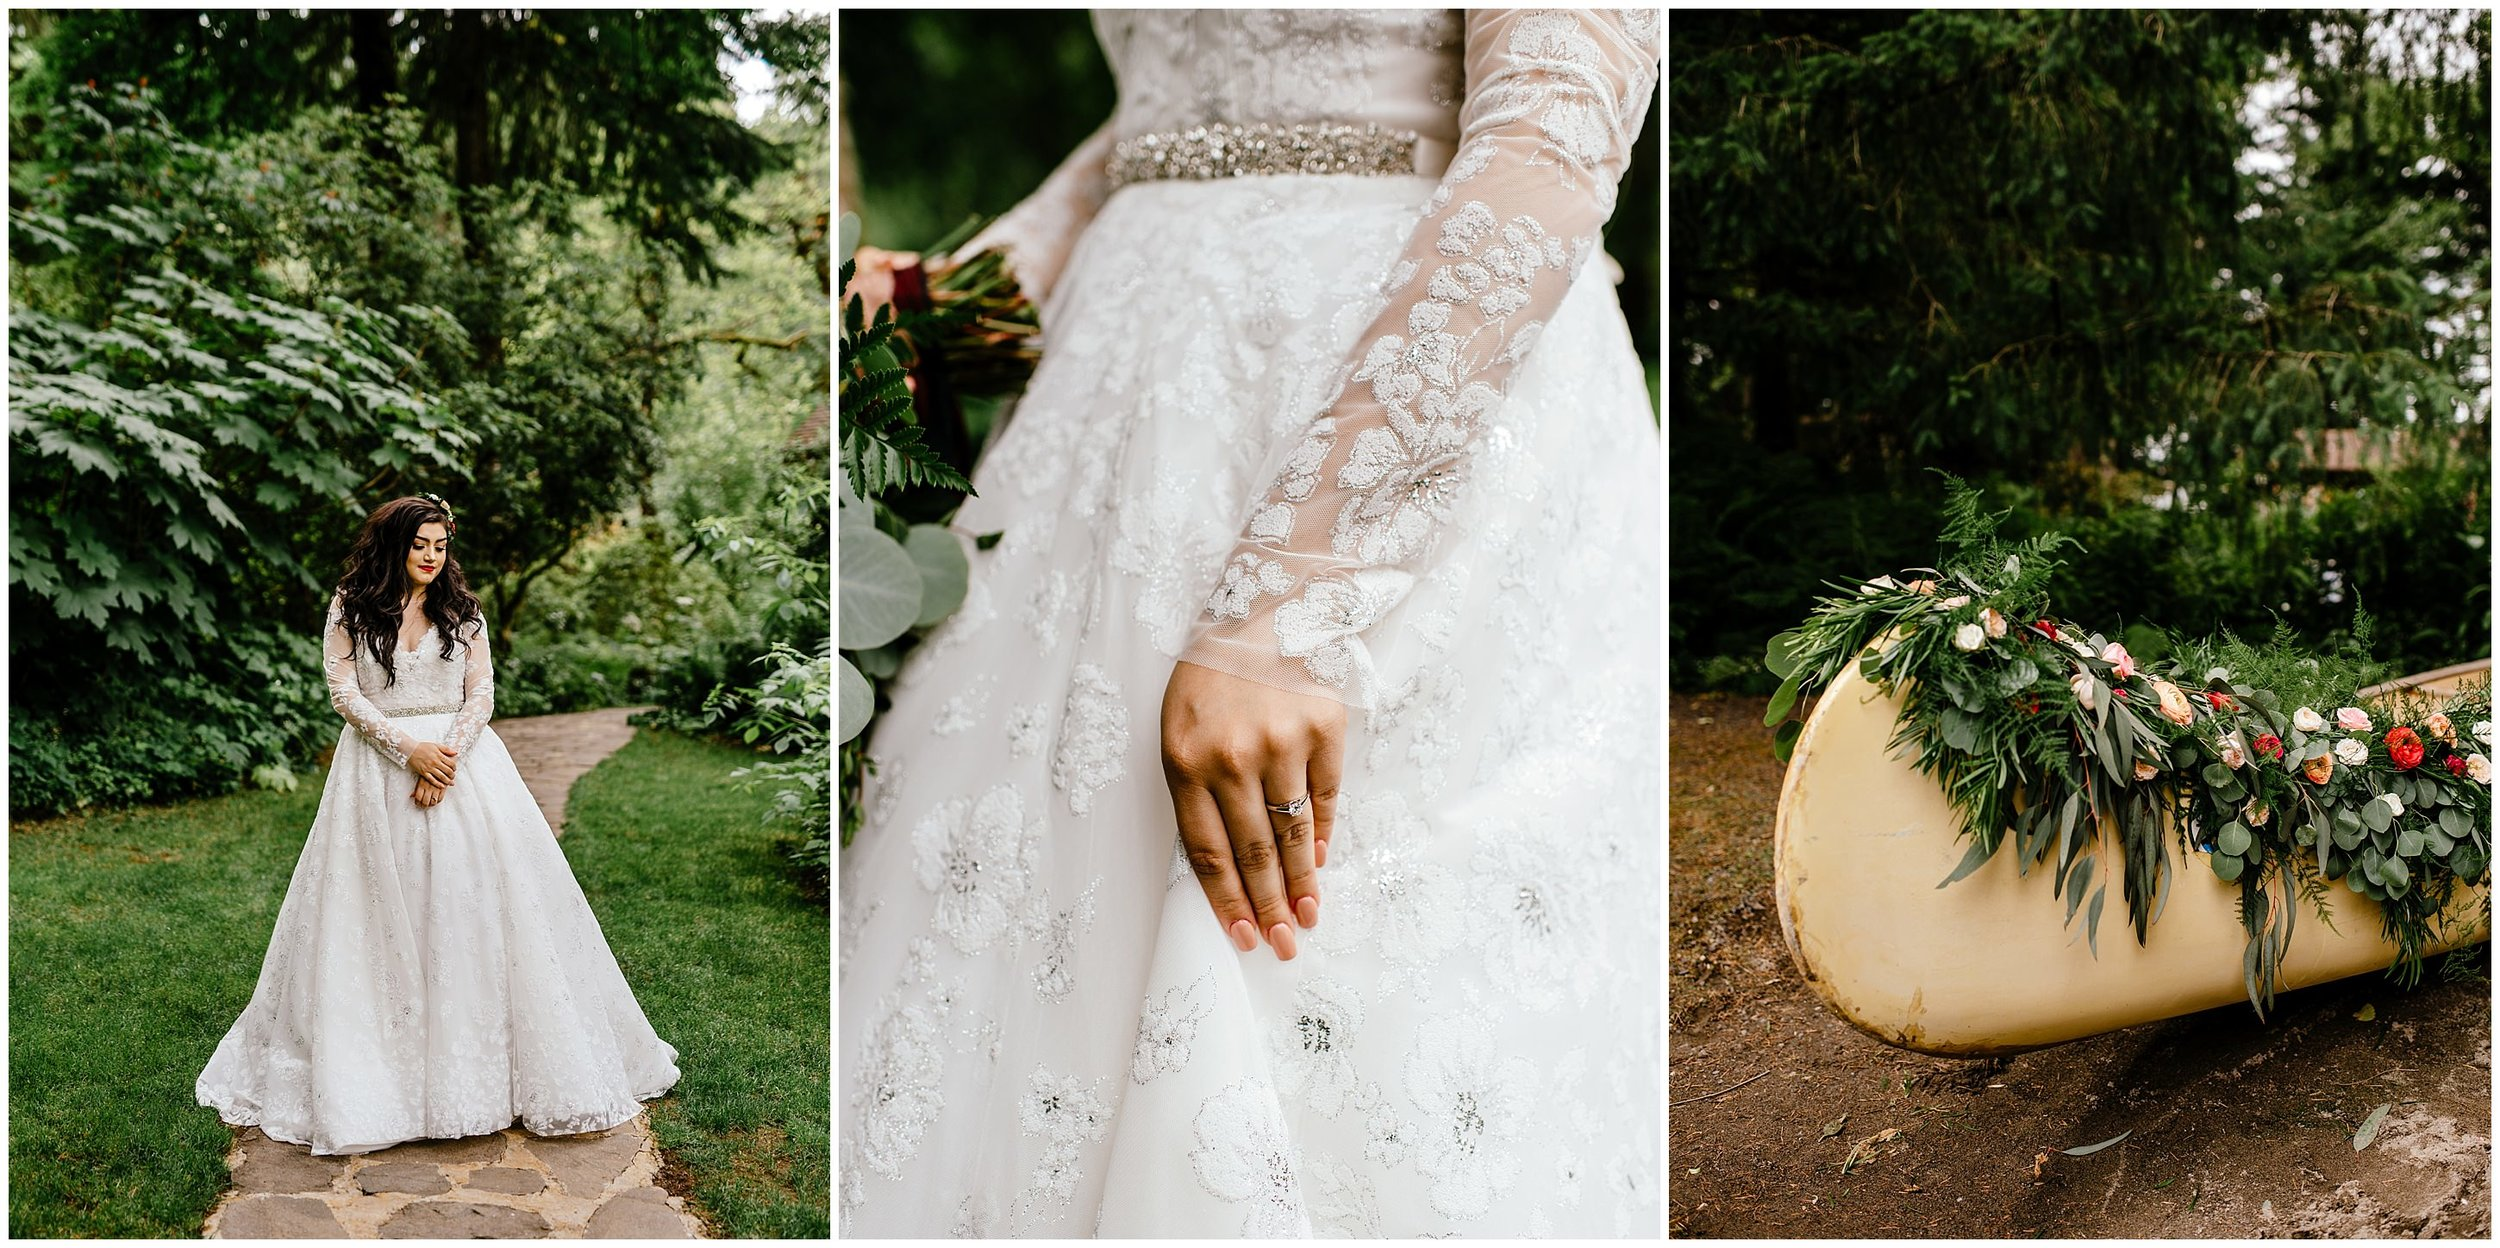 Spanish-inspired-wedding-bridal-veil-lakes-83.jpg